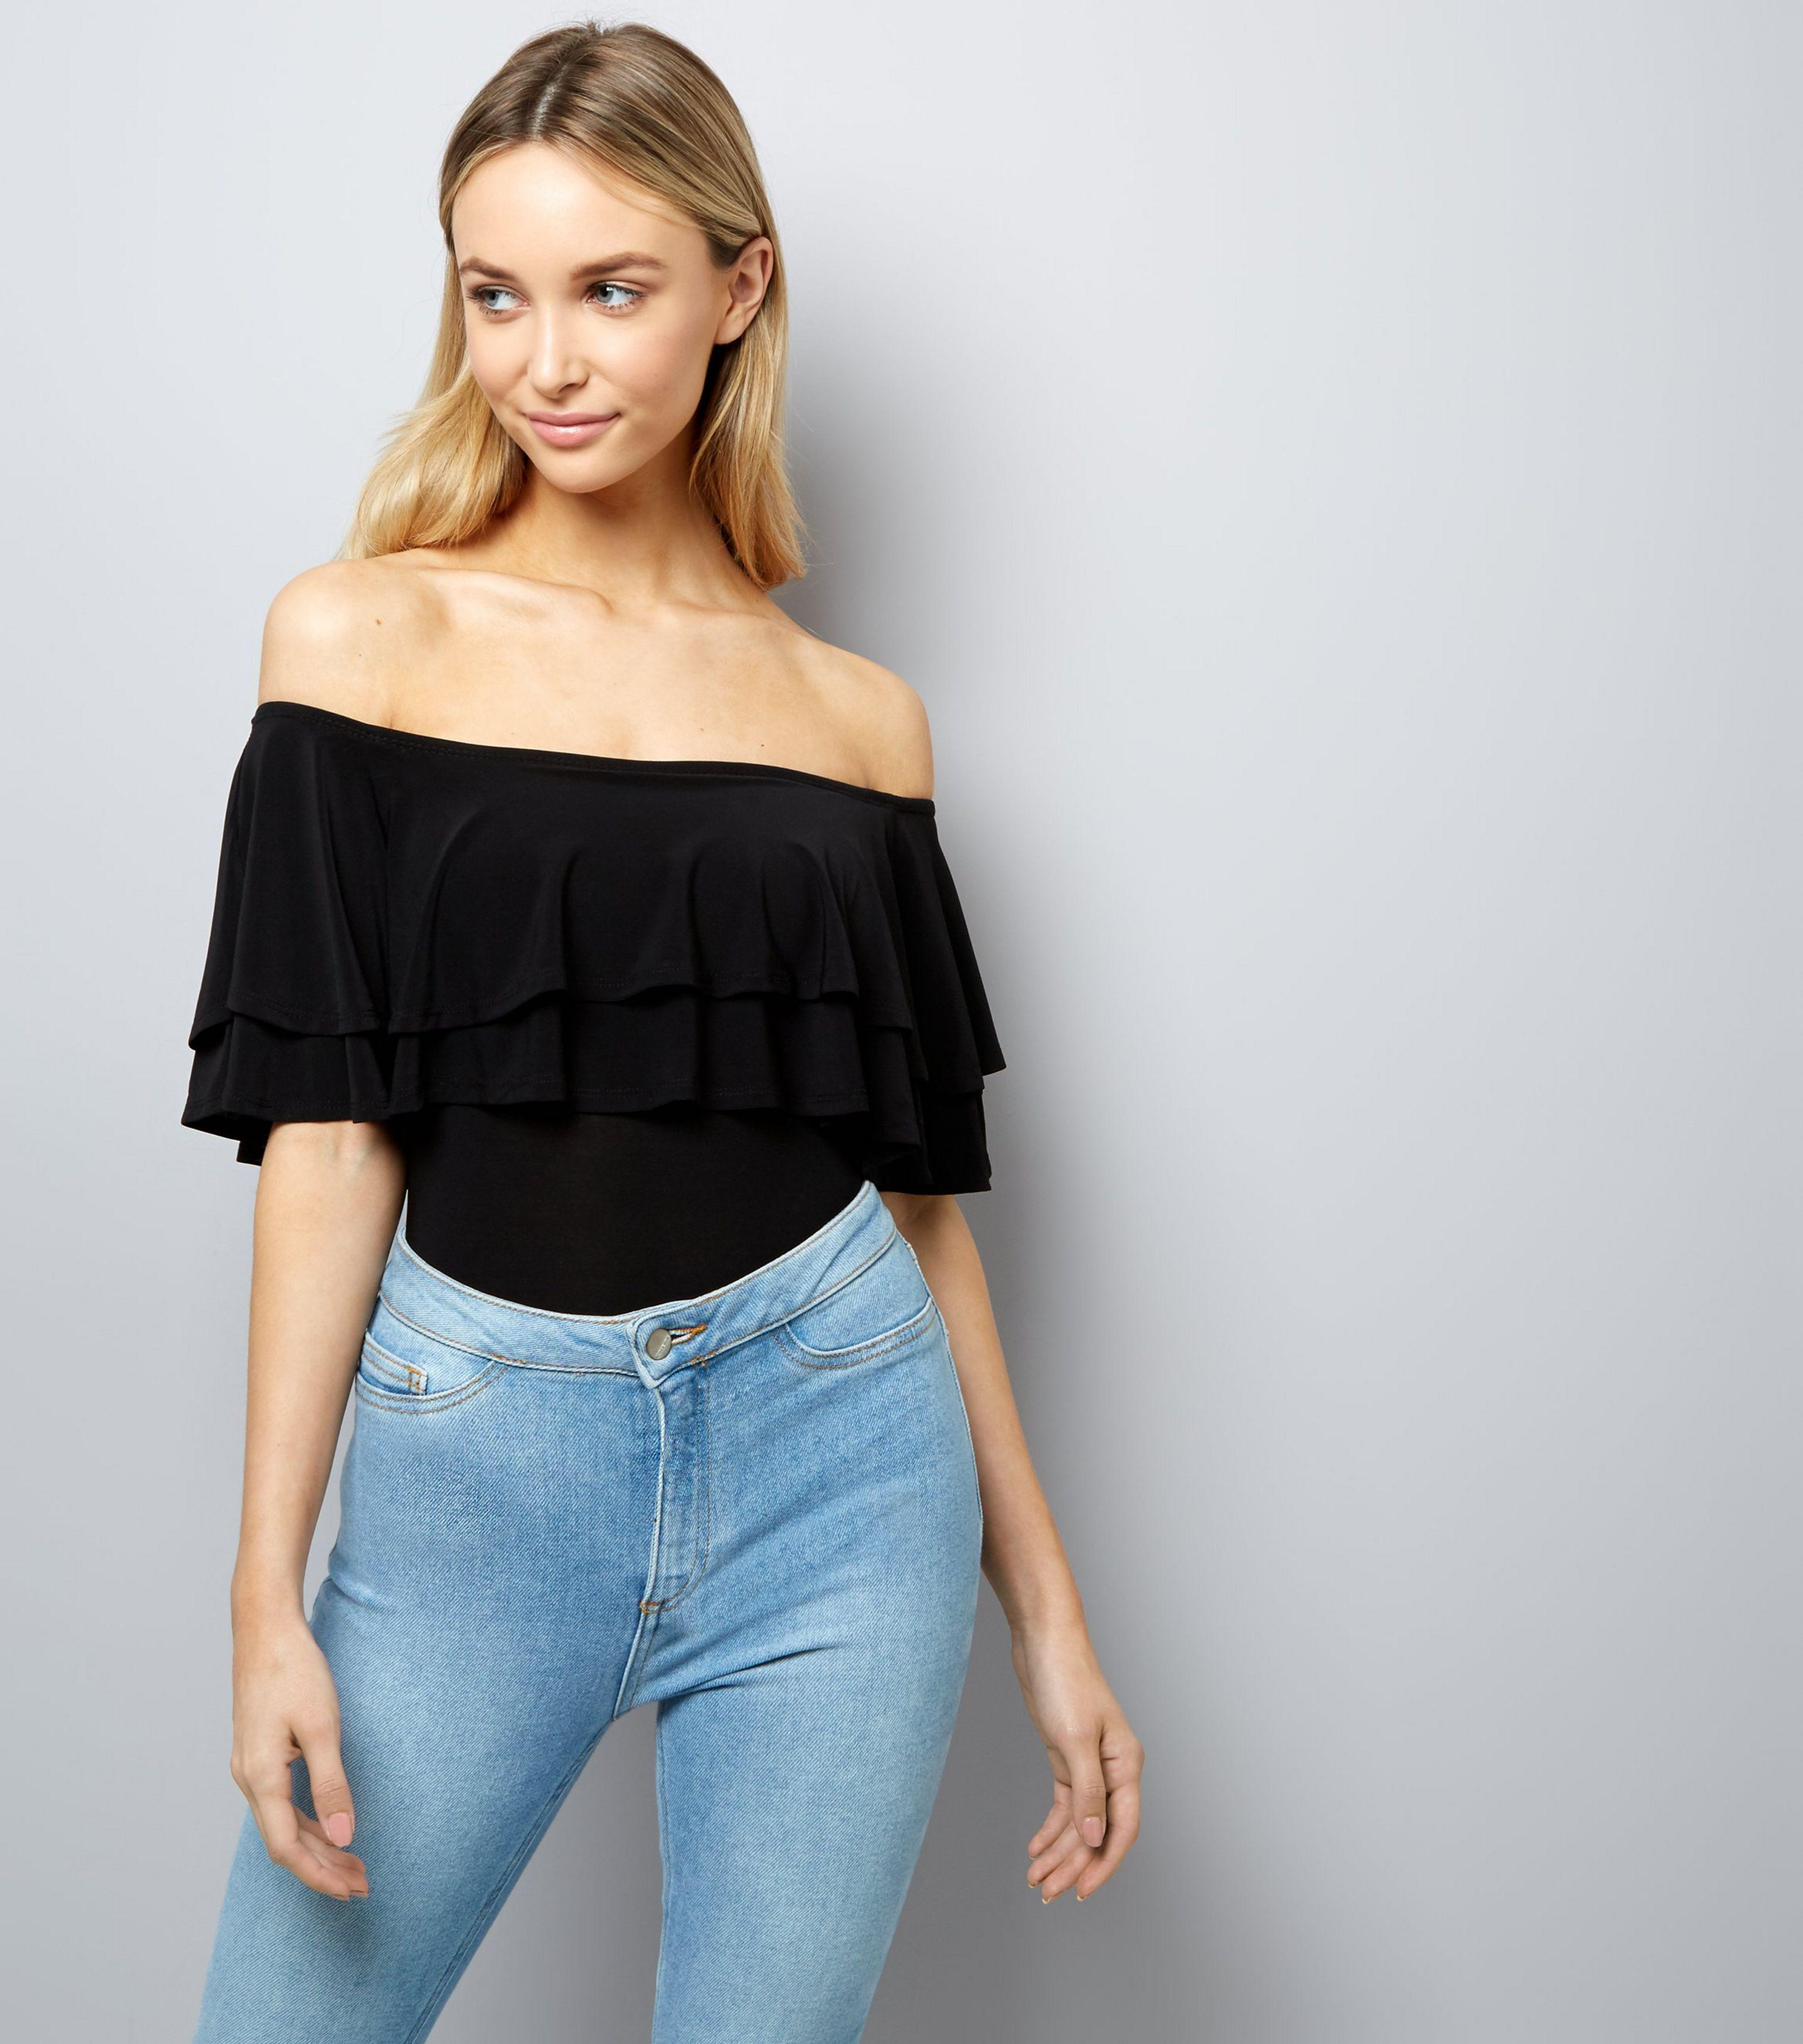 eaaa3df1485 New Look Black Layered Frill Trim Bardot Neck Bodysuit in Black - Lyst